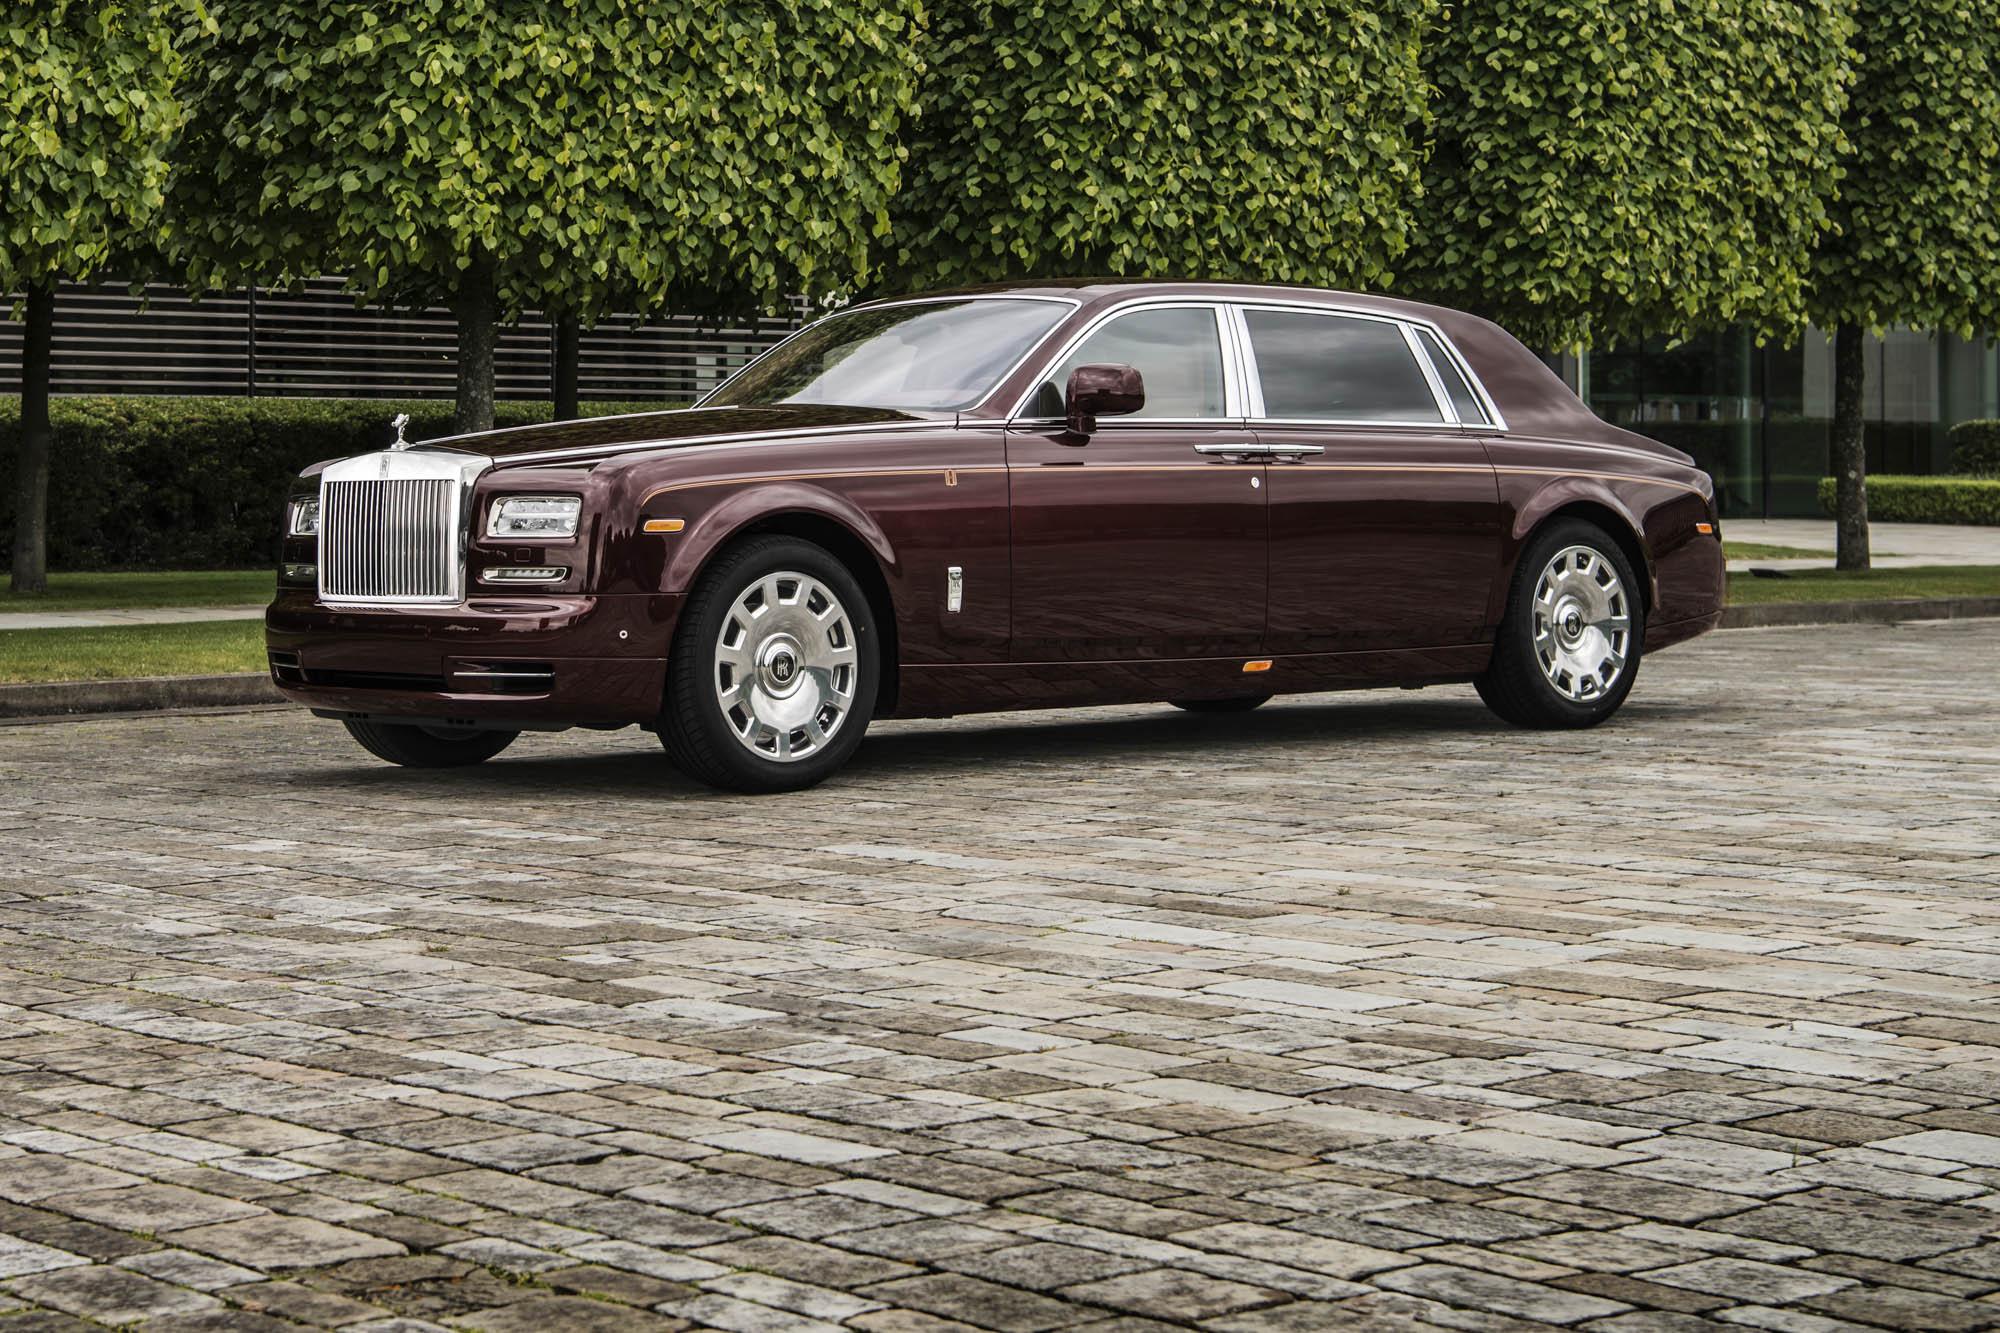 The Peace and Glory Rolls-Royce Phantom